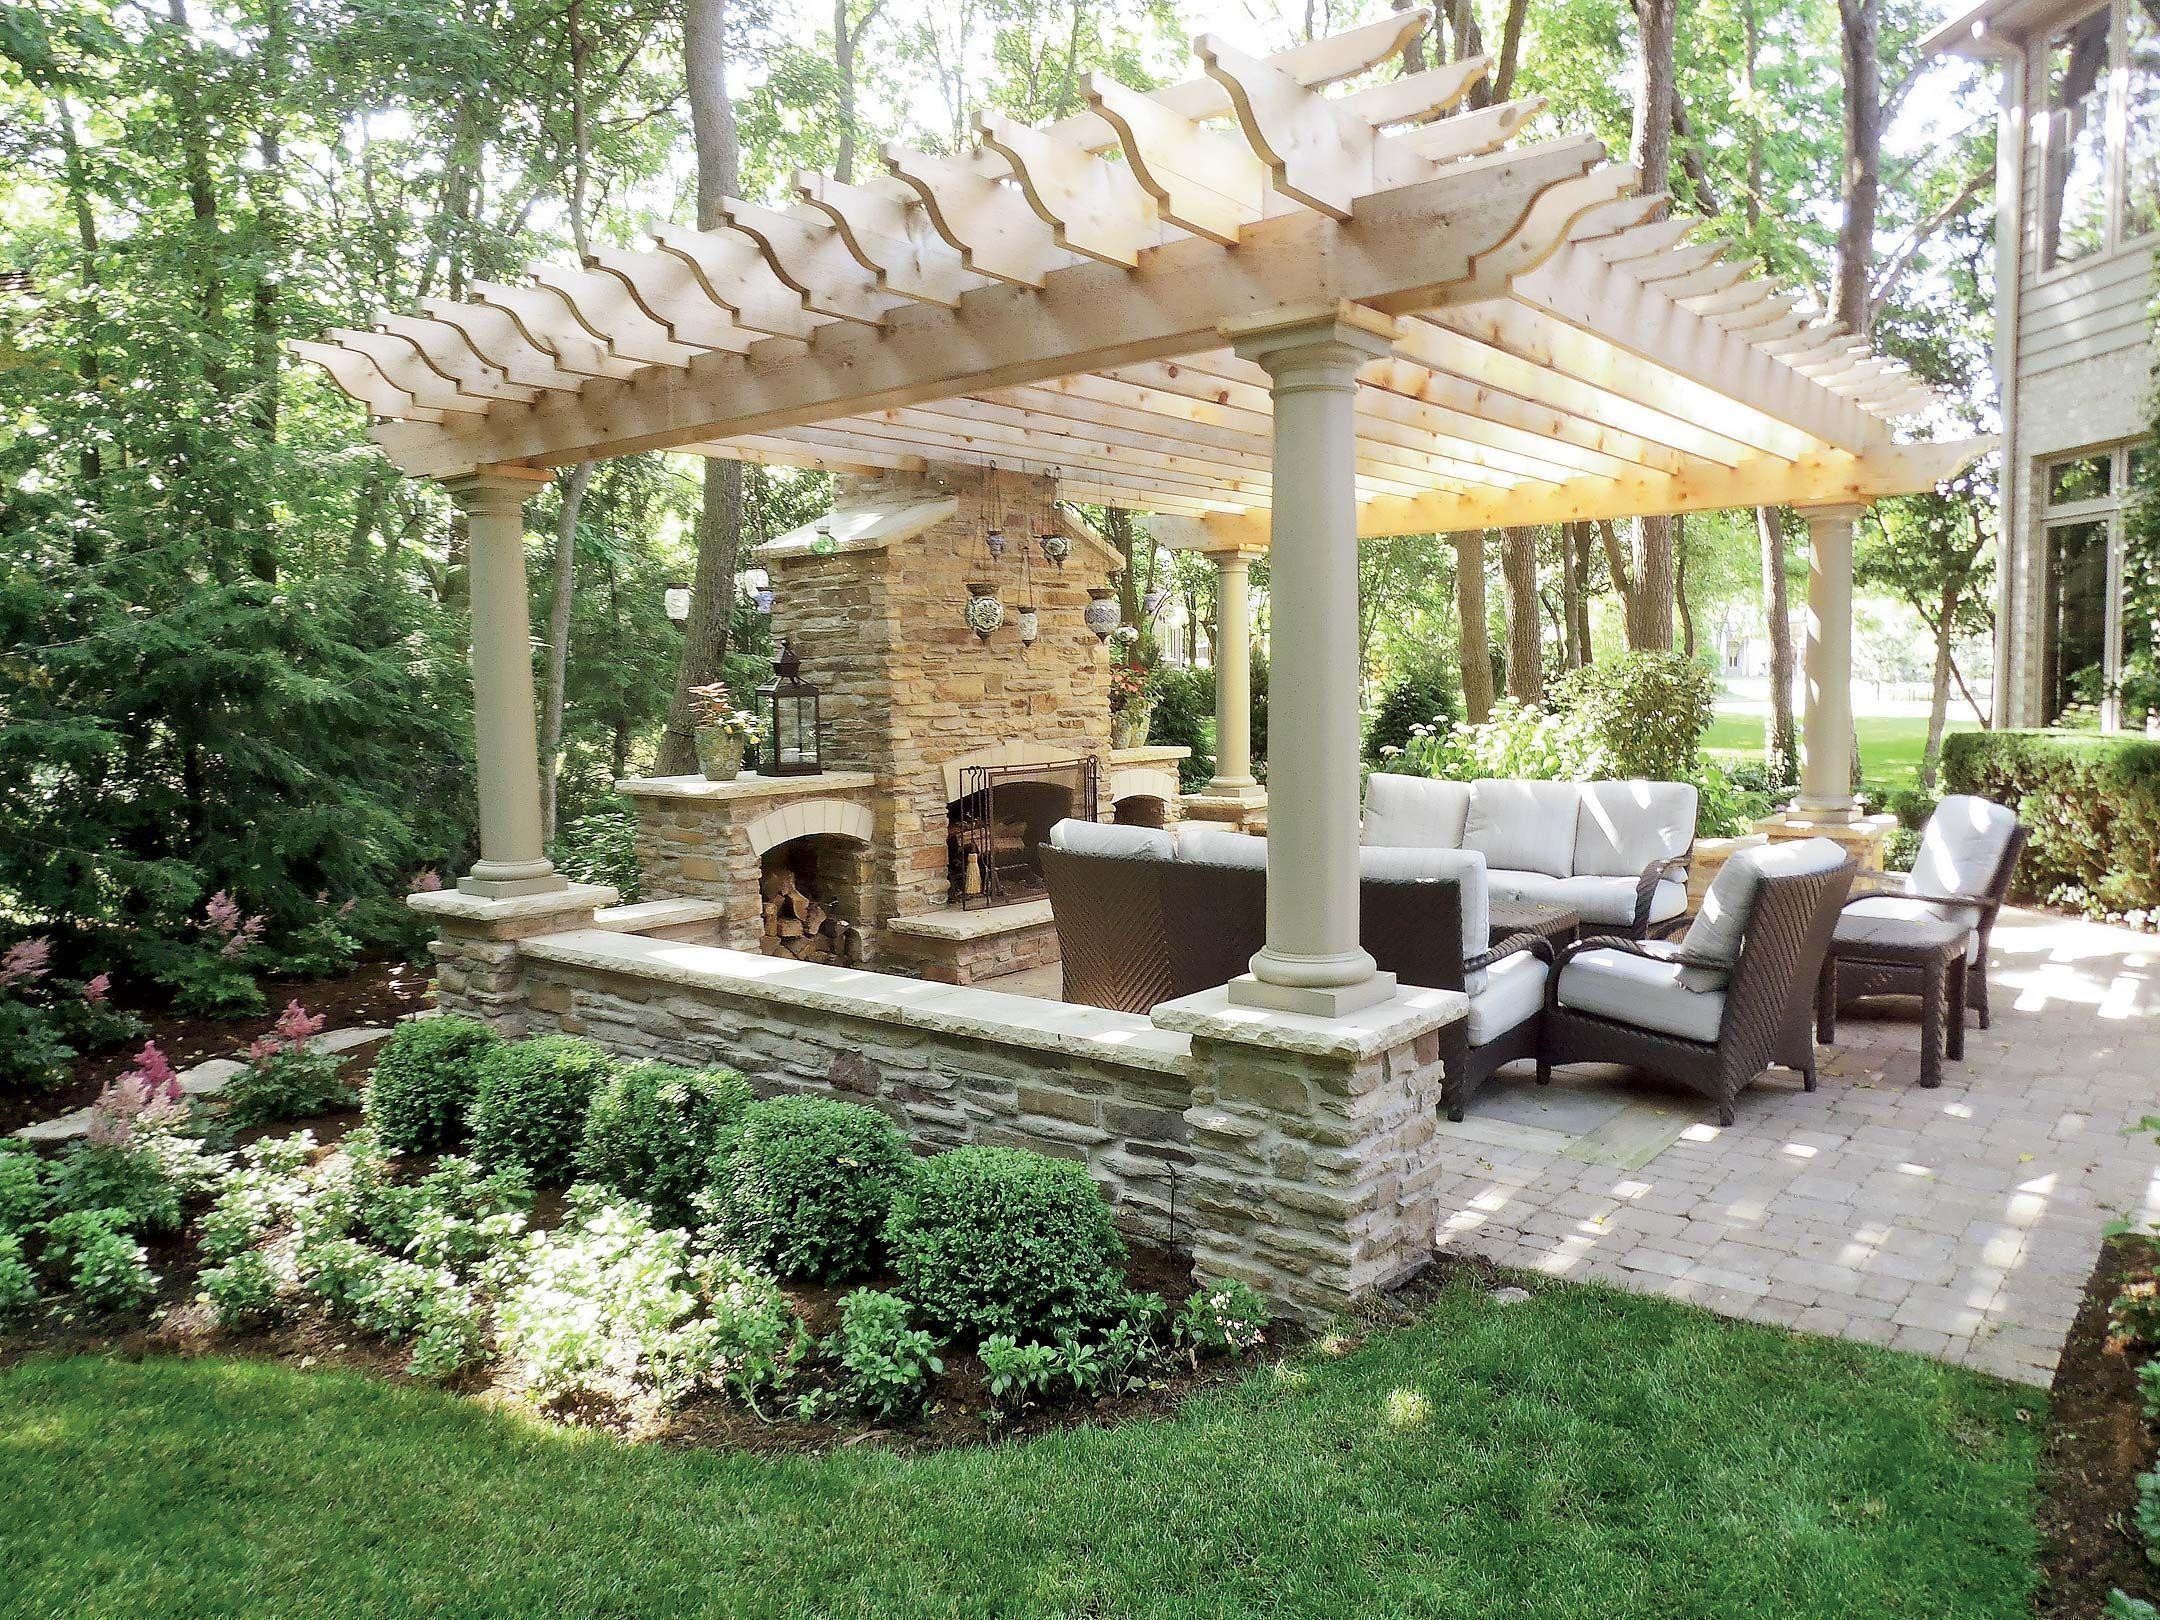 Creative Patio Outdoor Bar Ideas You Must Try At Your Backyard Ideas Diy Backyard Patio Backyard Pergola